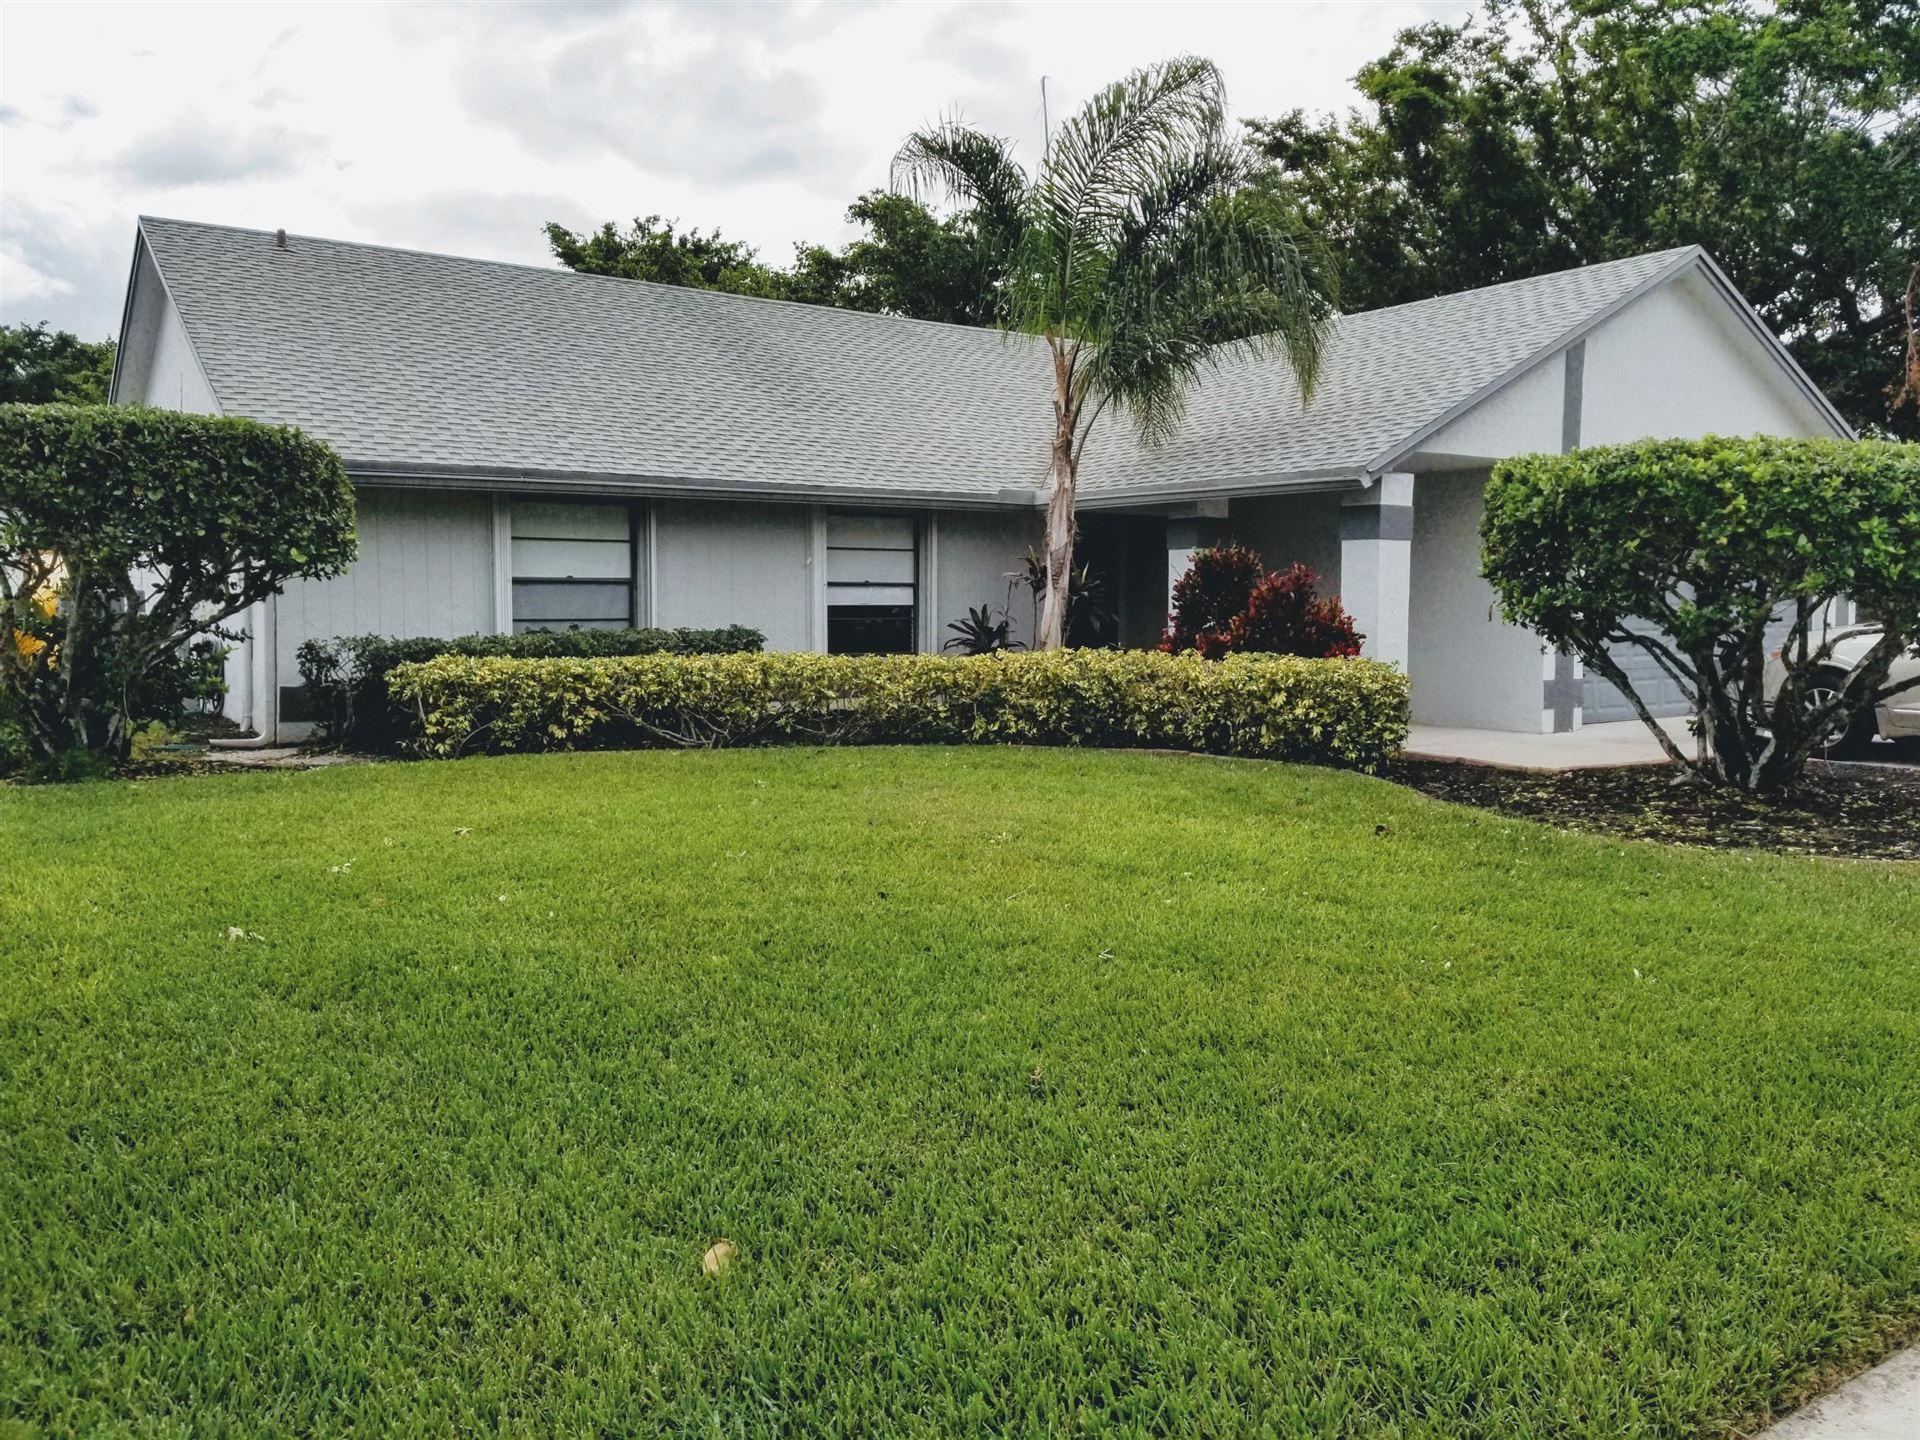 9222 Tivoli Place, Boca Raton, FL 33428 - MLS#: RX-10734464